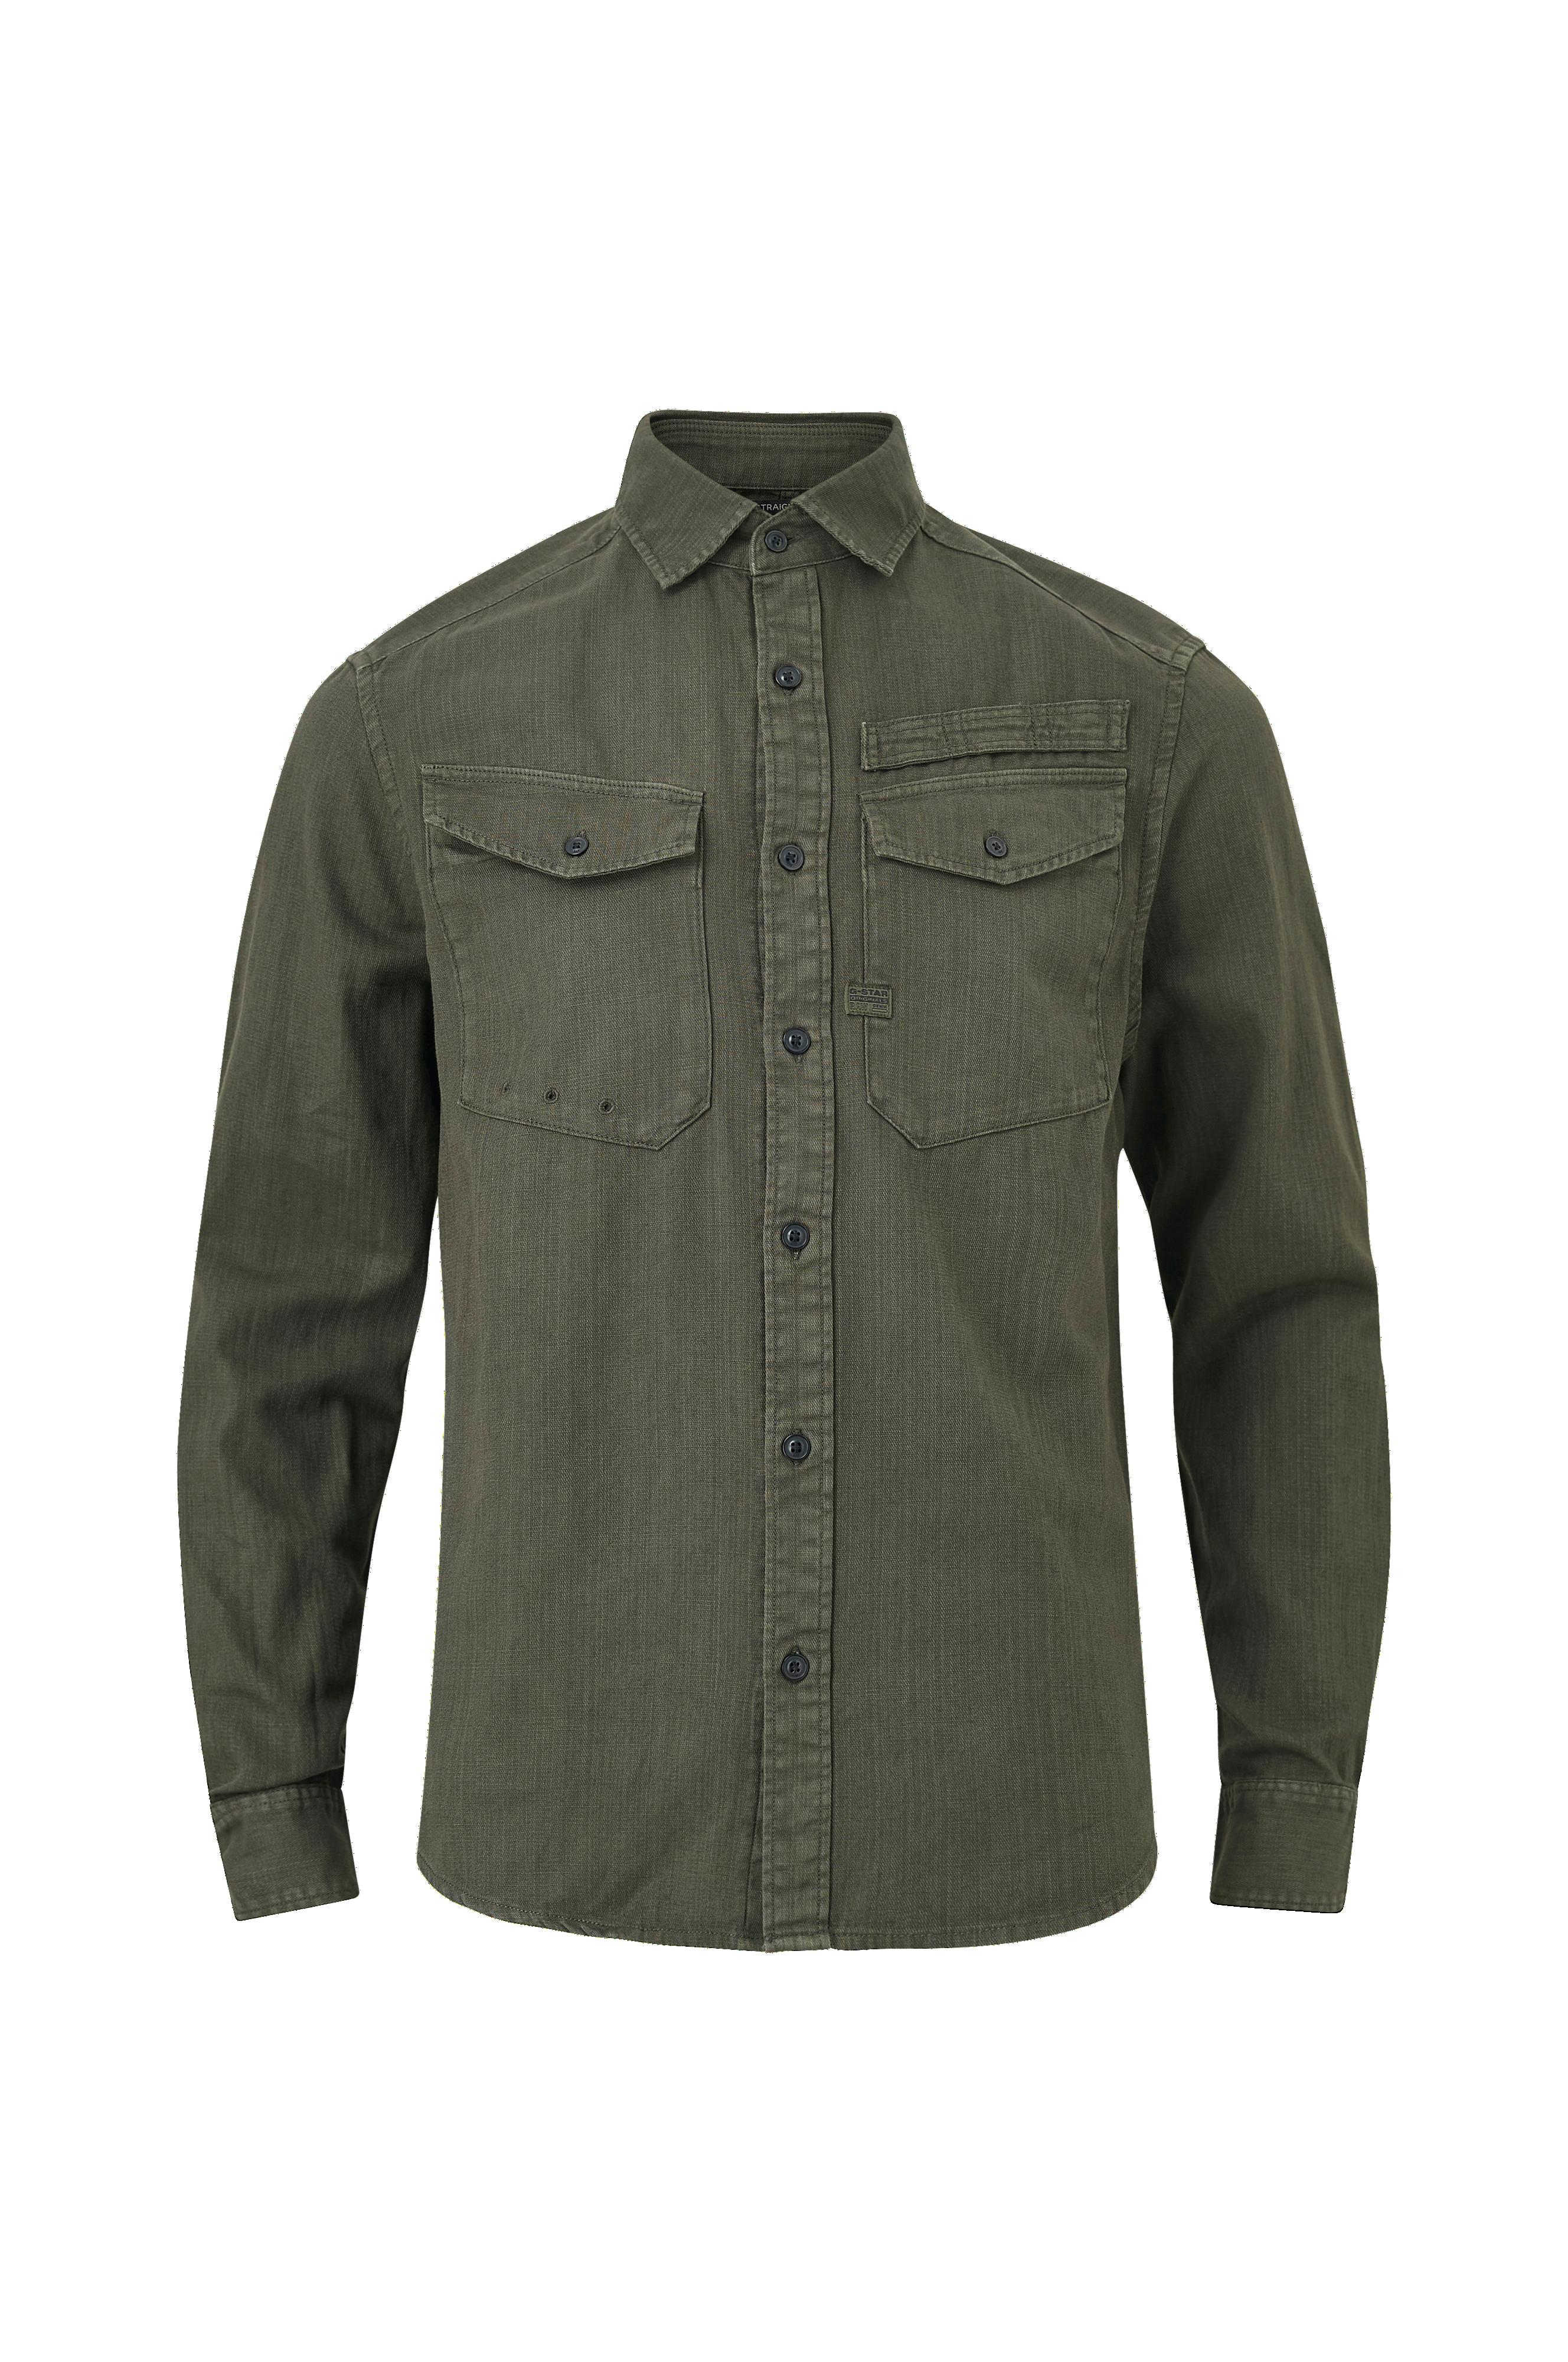 G Star Skjorte Army Straight Shirt Grå Langermede